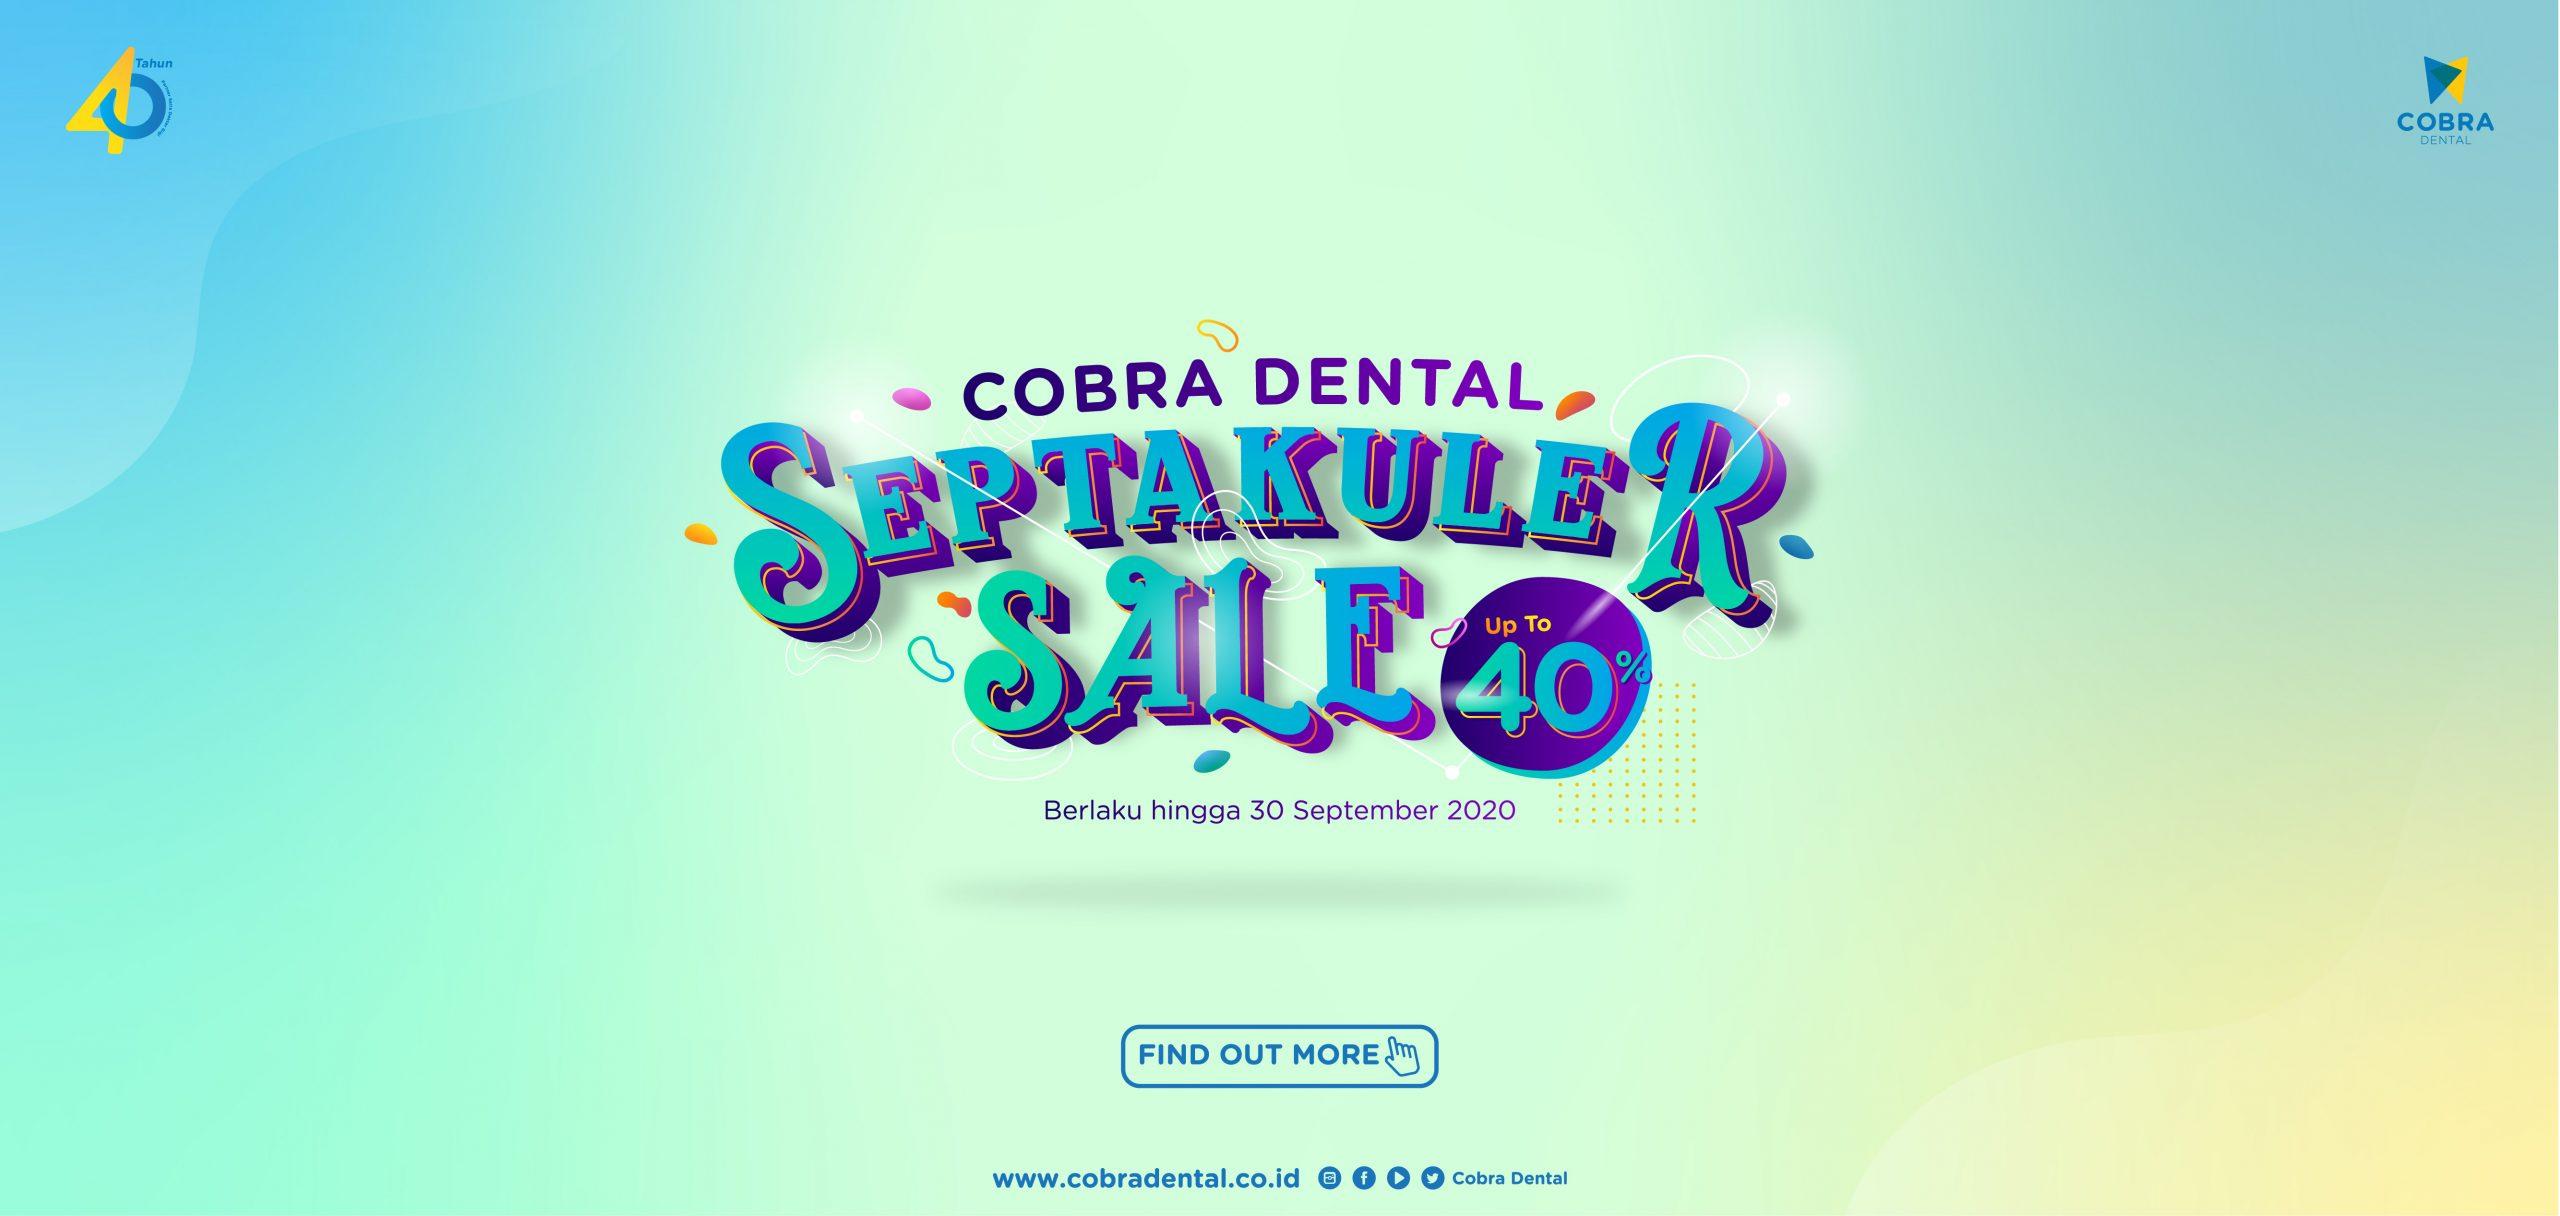 Promo September Cobra Dental - Septakuler sale